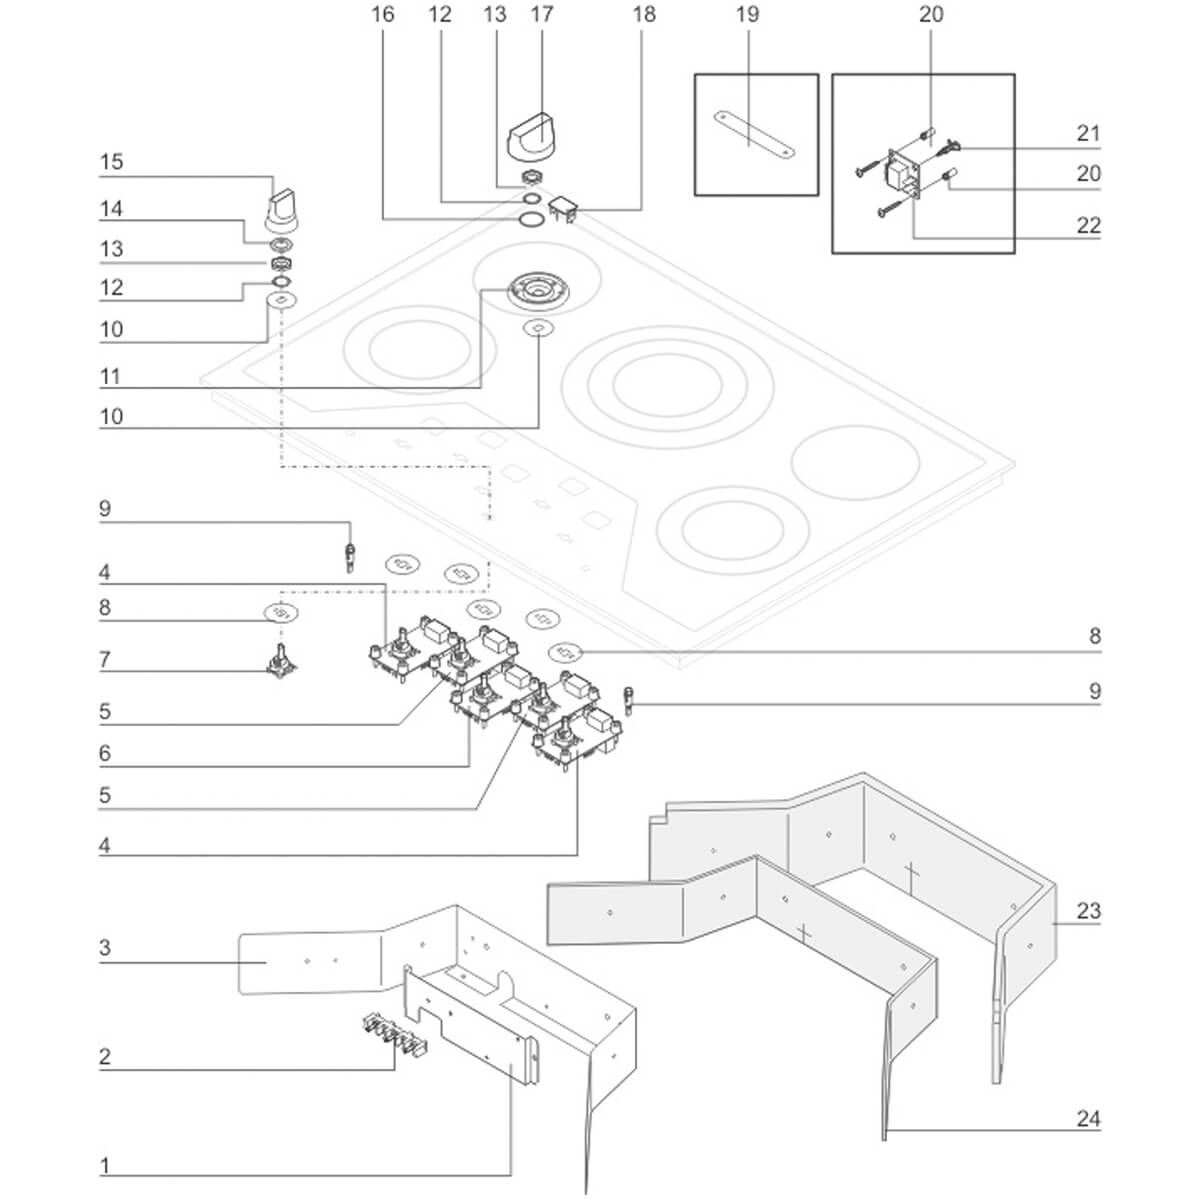 Manipulo Mesa Do Cooktop Elétrico Electrolux ECI65 - 18319101